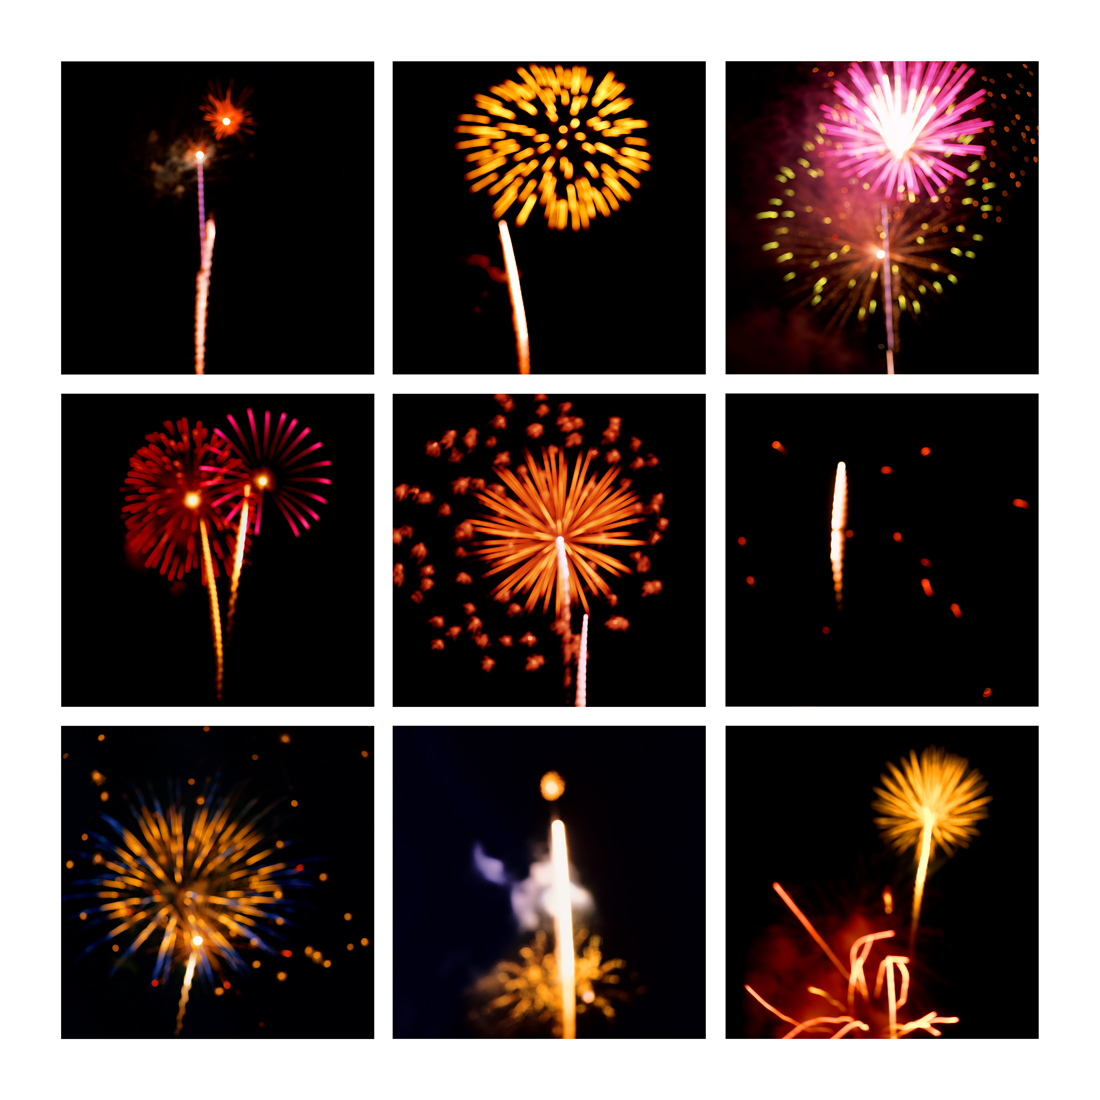 Fireworks #9, 2019 (2008-2019)